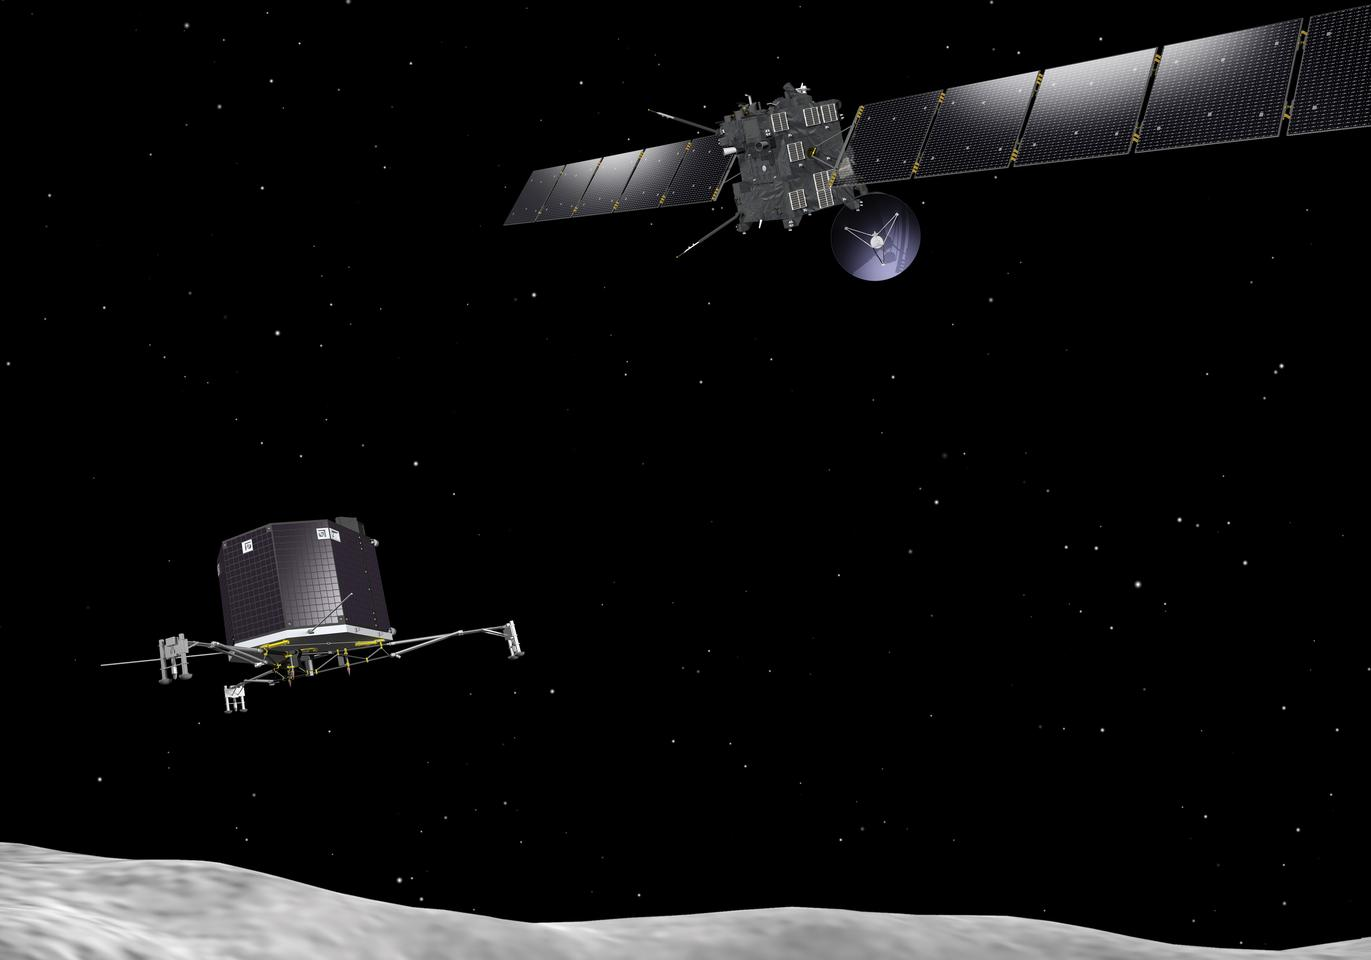 Artist's concept of the Rosetta orbiter and the Philae lander (Image: ESA)